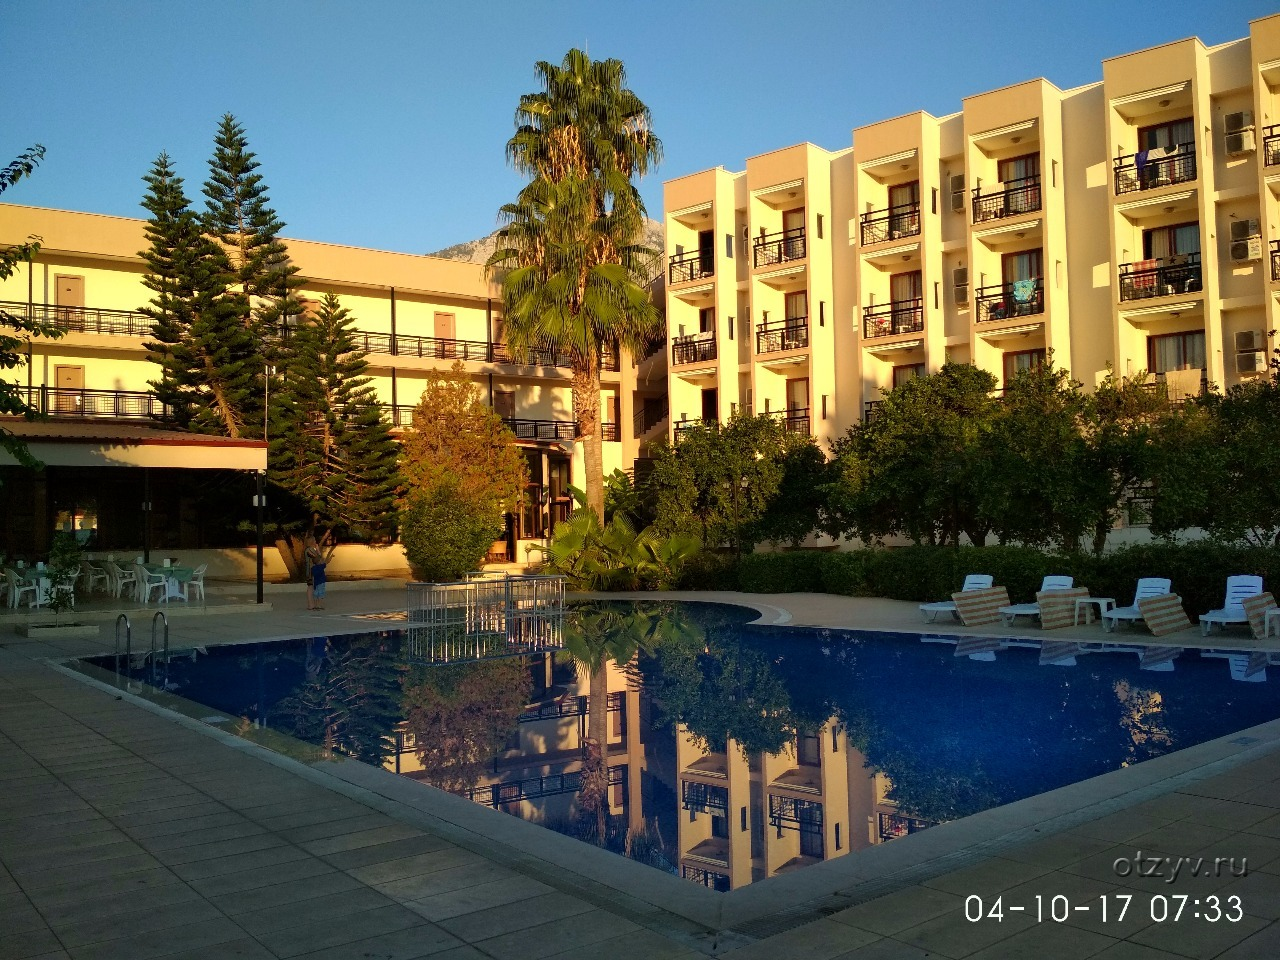 Korient Hotel 3 (Turkey, Kemer): description, photo and reviews 71